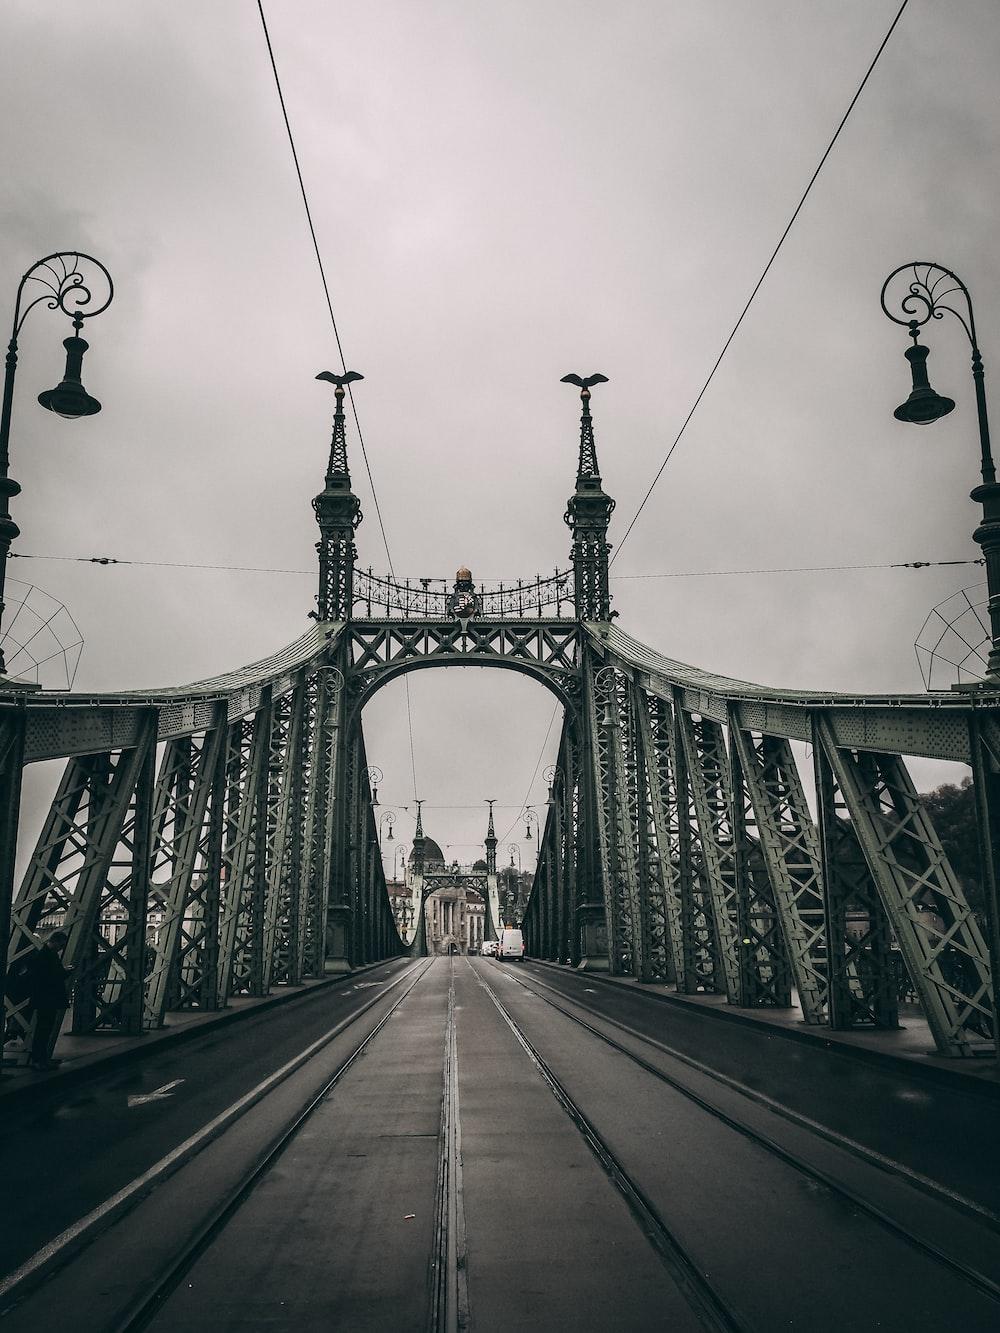 people walking on bridge under cloudy sky during daytime